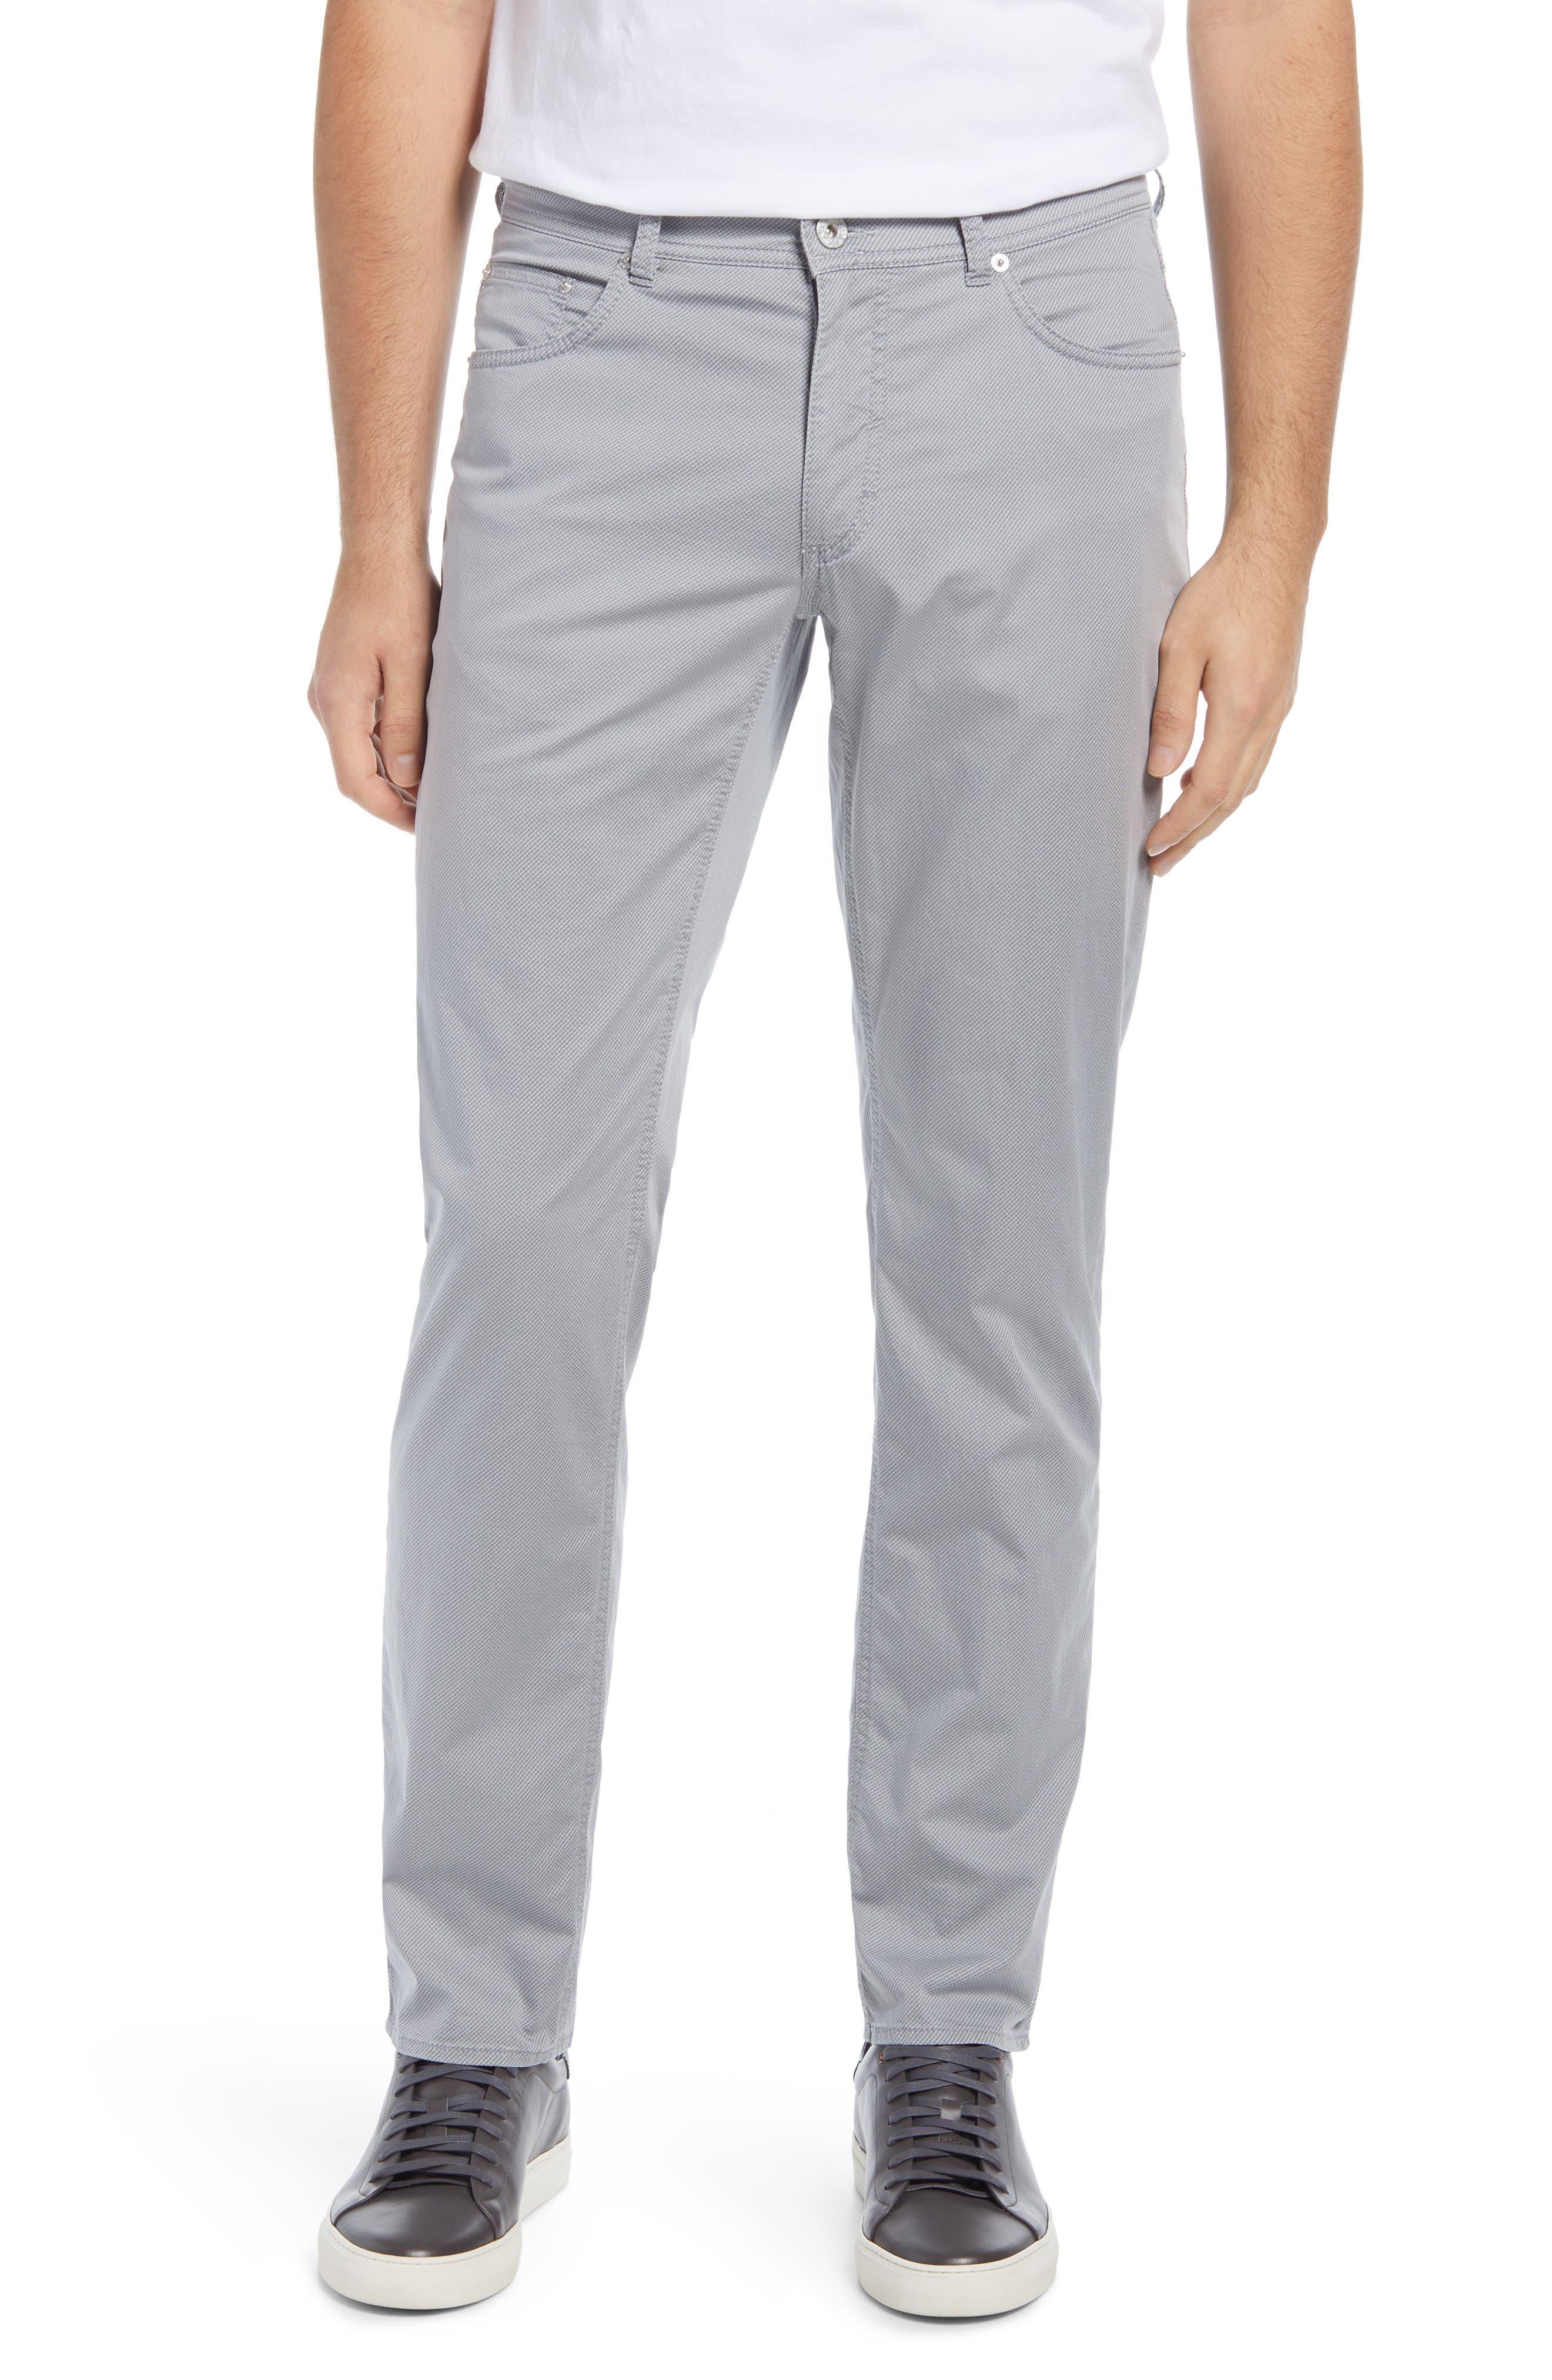 Cooper Ultralight Five Pocket Pants